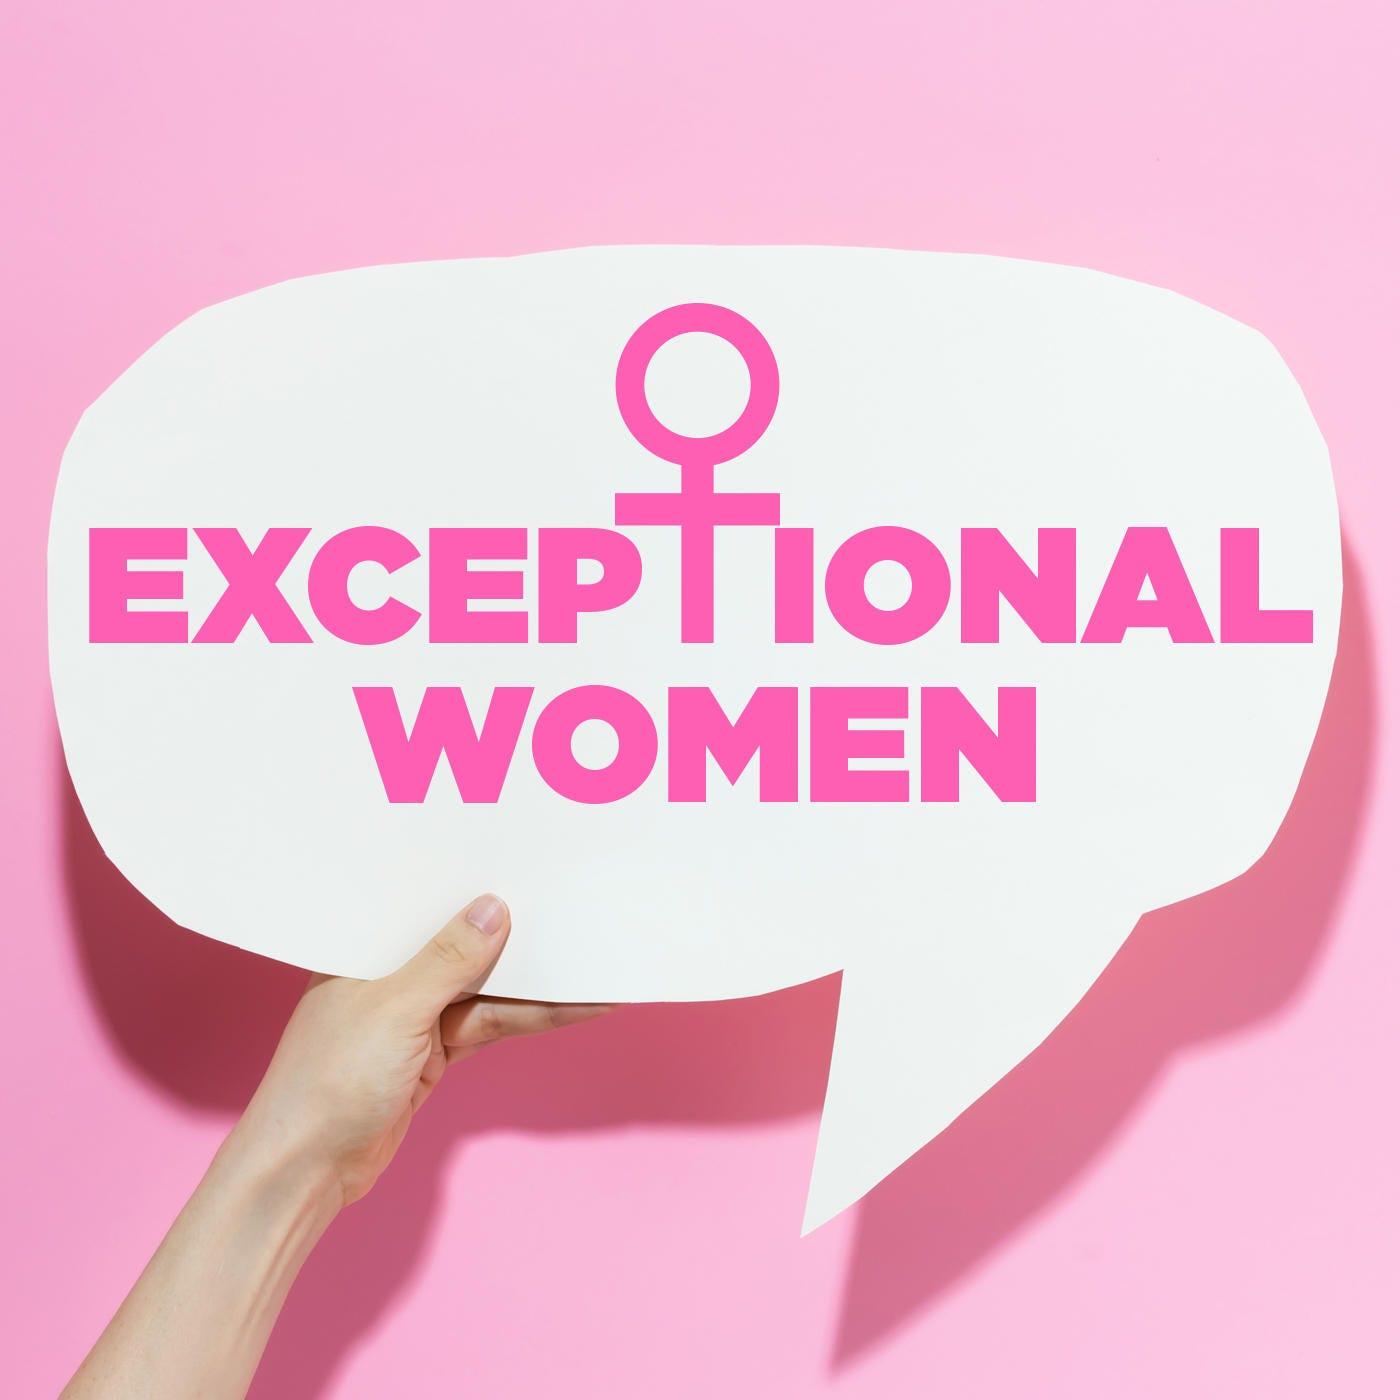 Exceptional Women